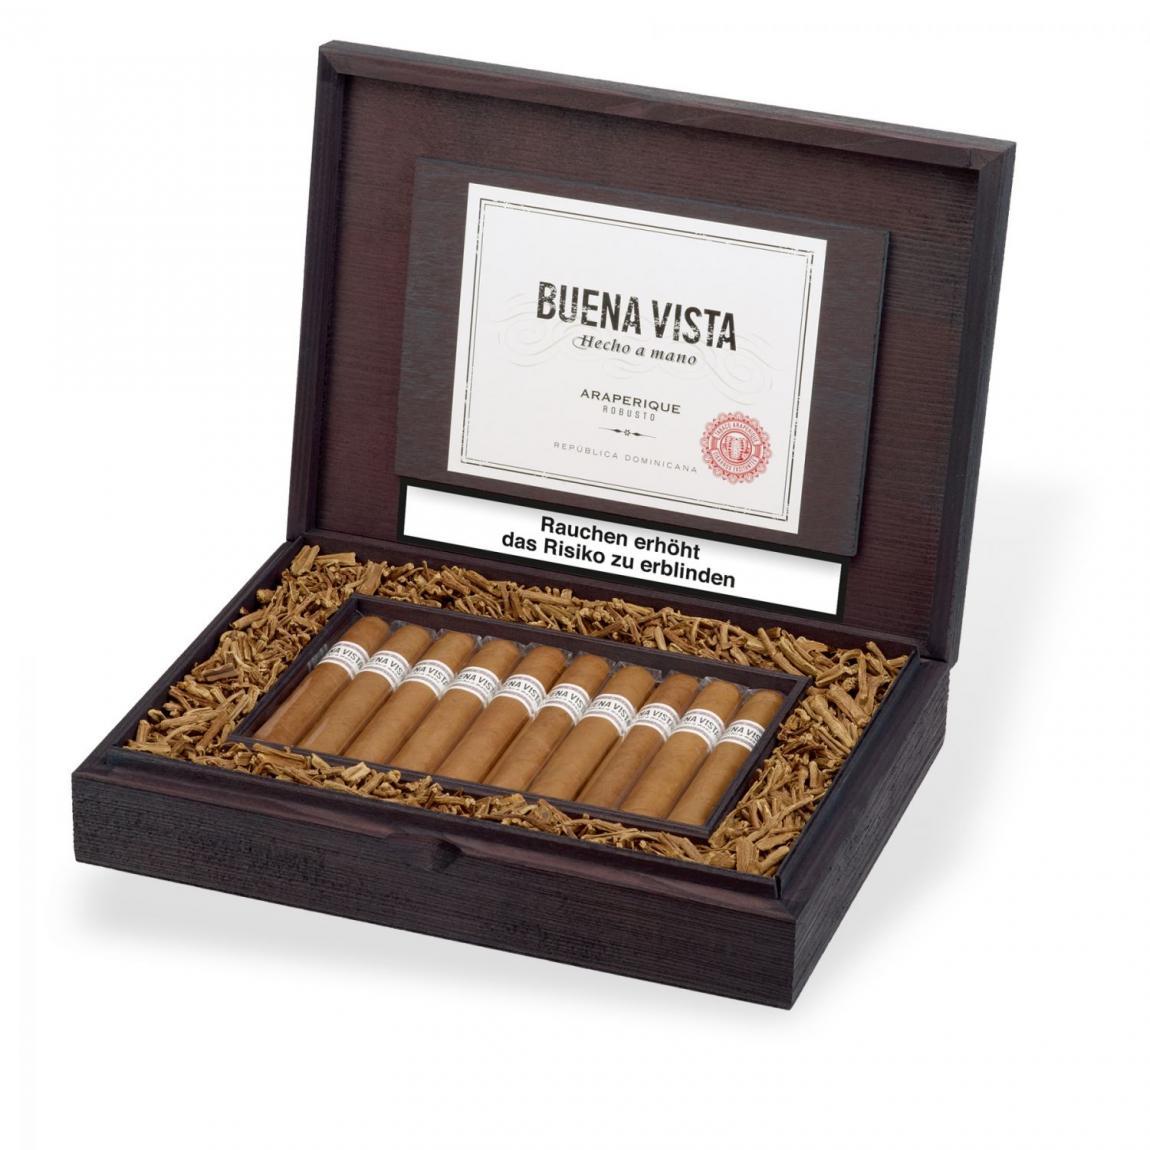 Buena Vista Araperique Robustos 5er Kiste